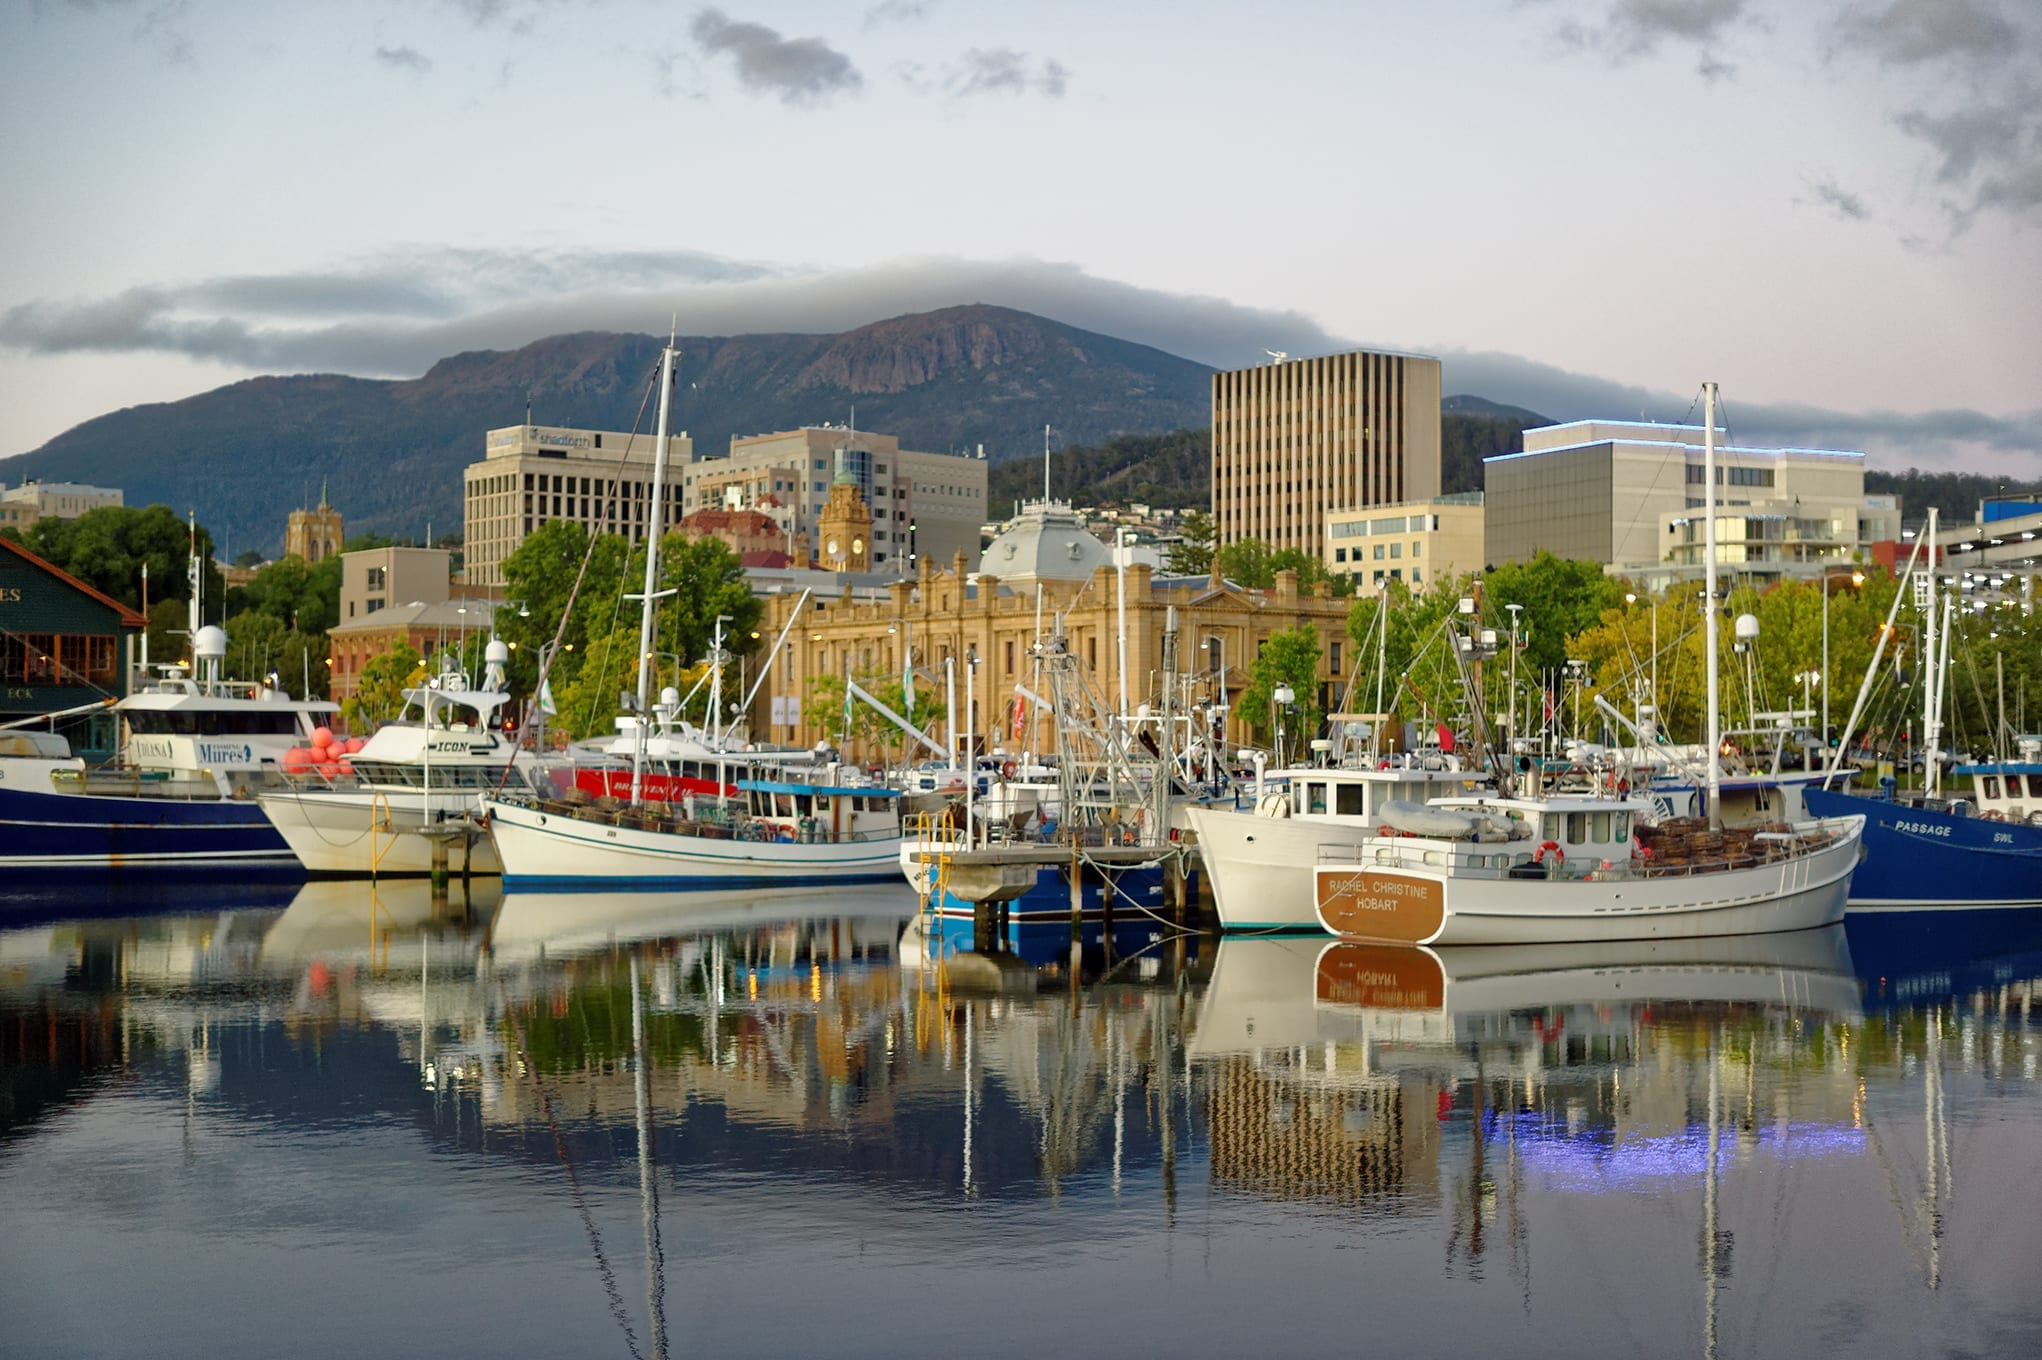 Hobart marina, Tasmania